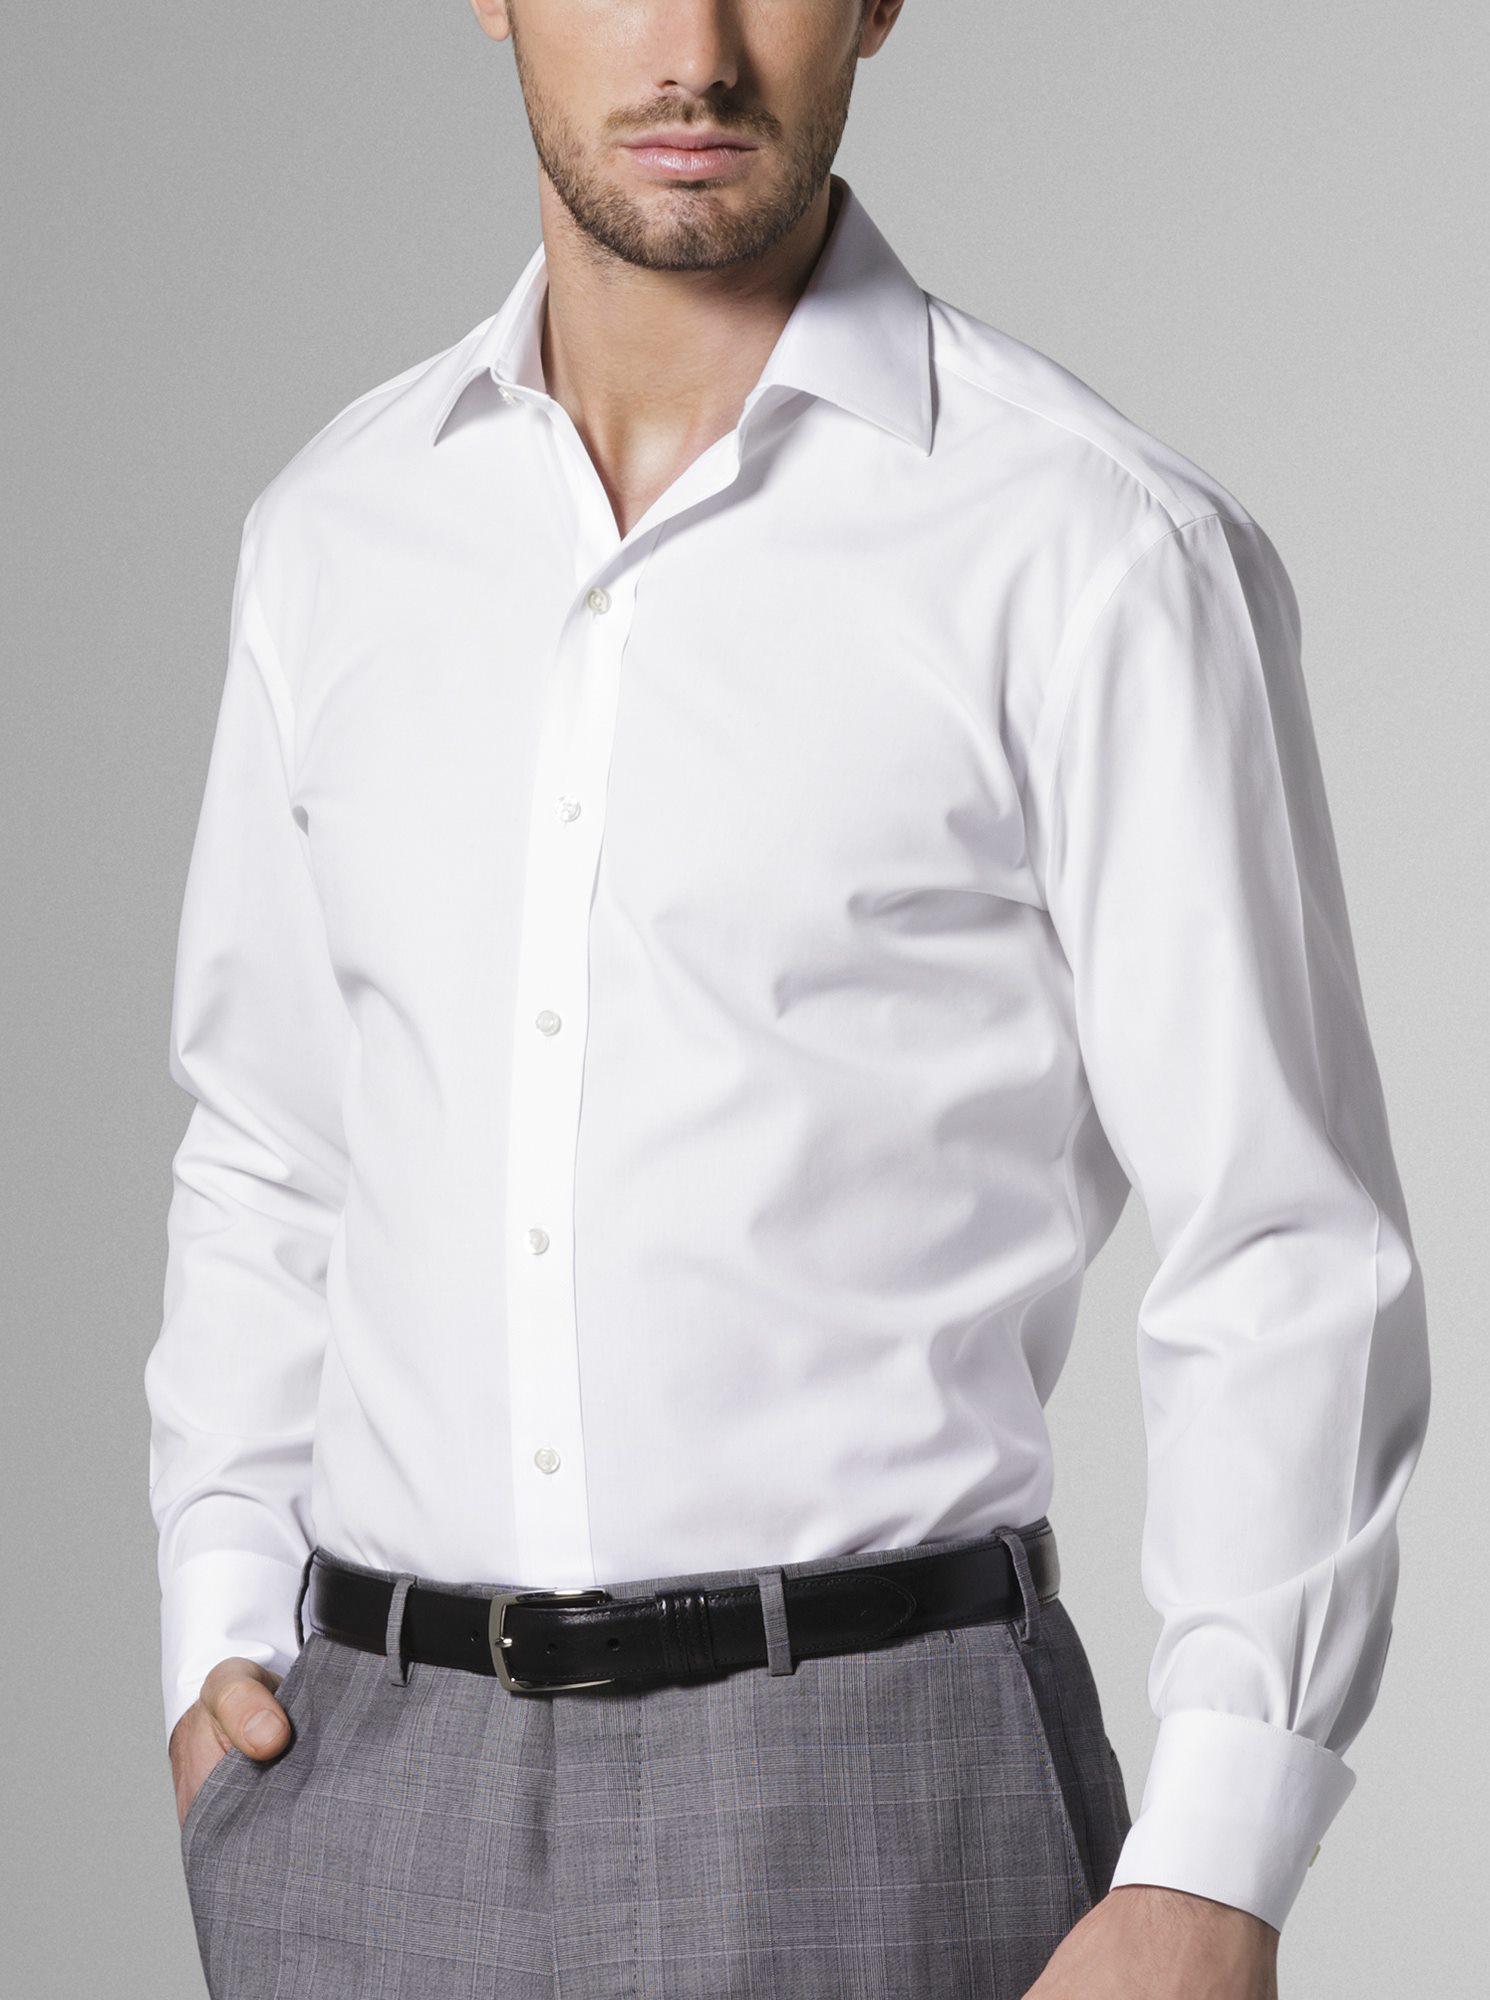 Wrinkle Free Dress Shirt White J Hilburn